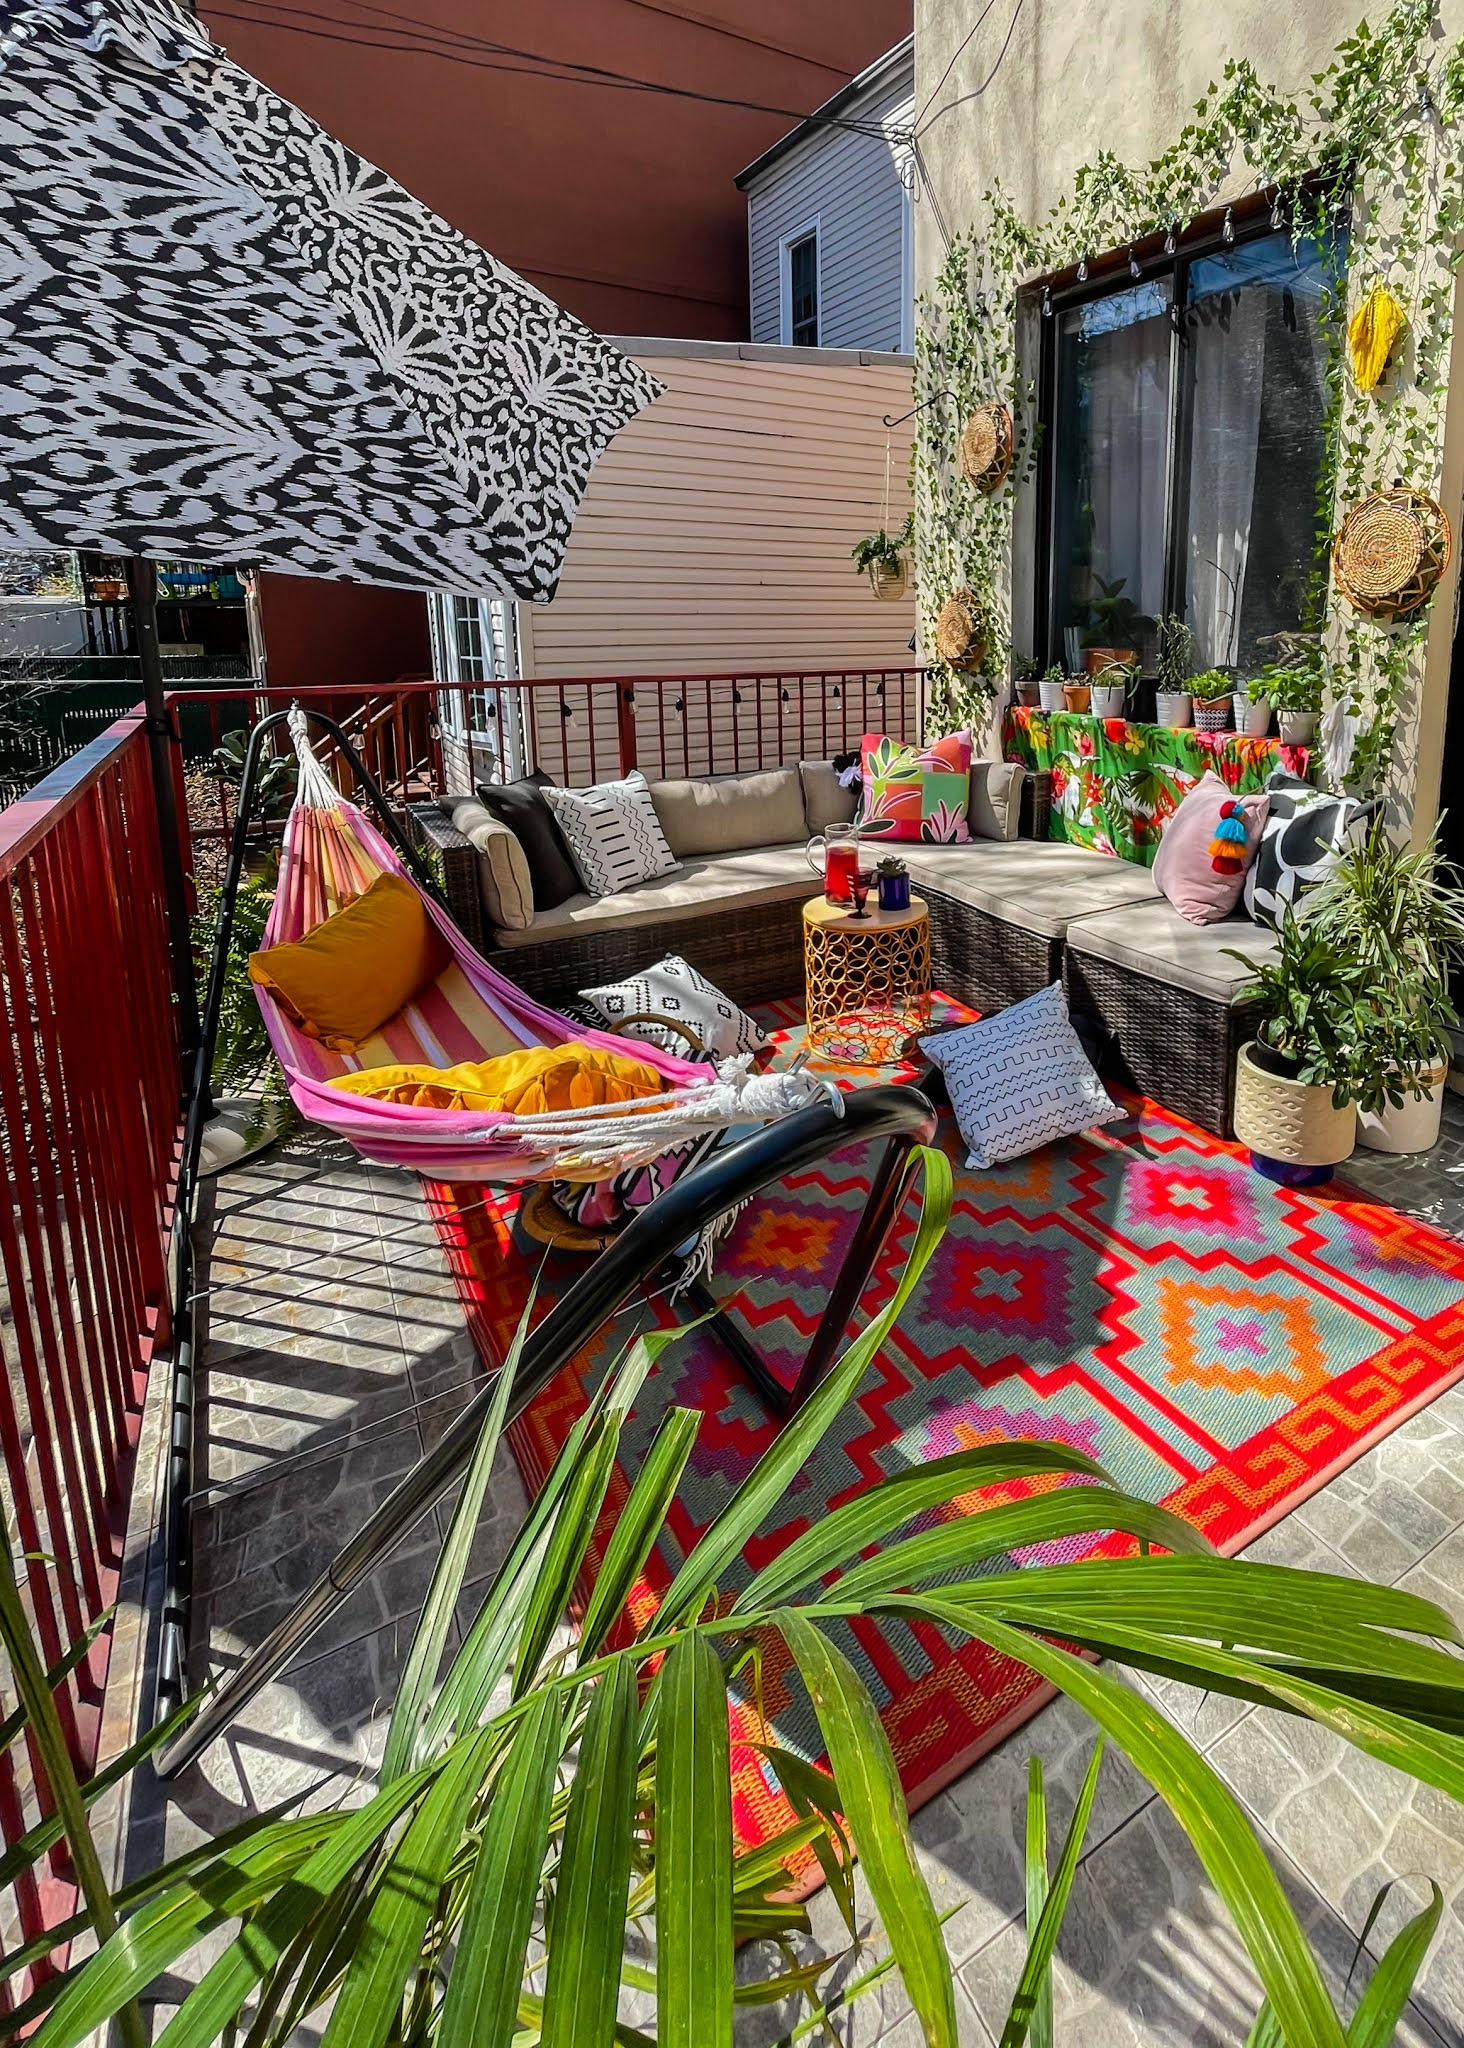 Renter-Friendly Patio Decor,  patio decor, faux ivy wall, command outdoor light clips, patio decor ideas, faux ivy wall diy, small space patio decor, small patio design ideas